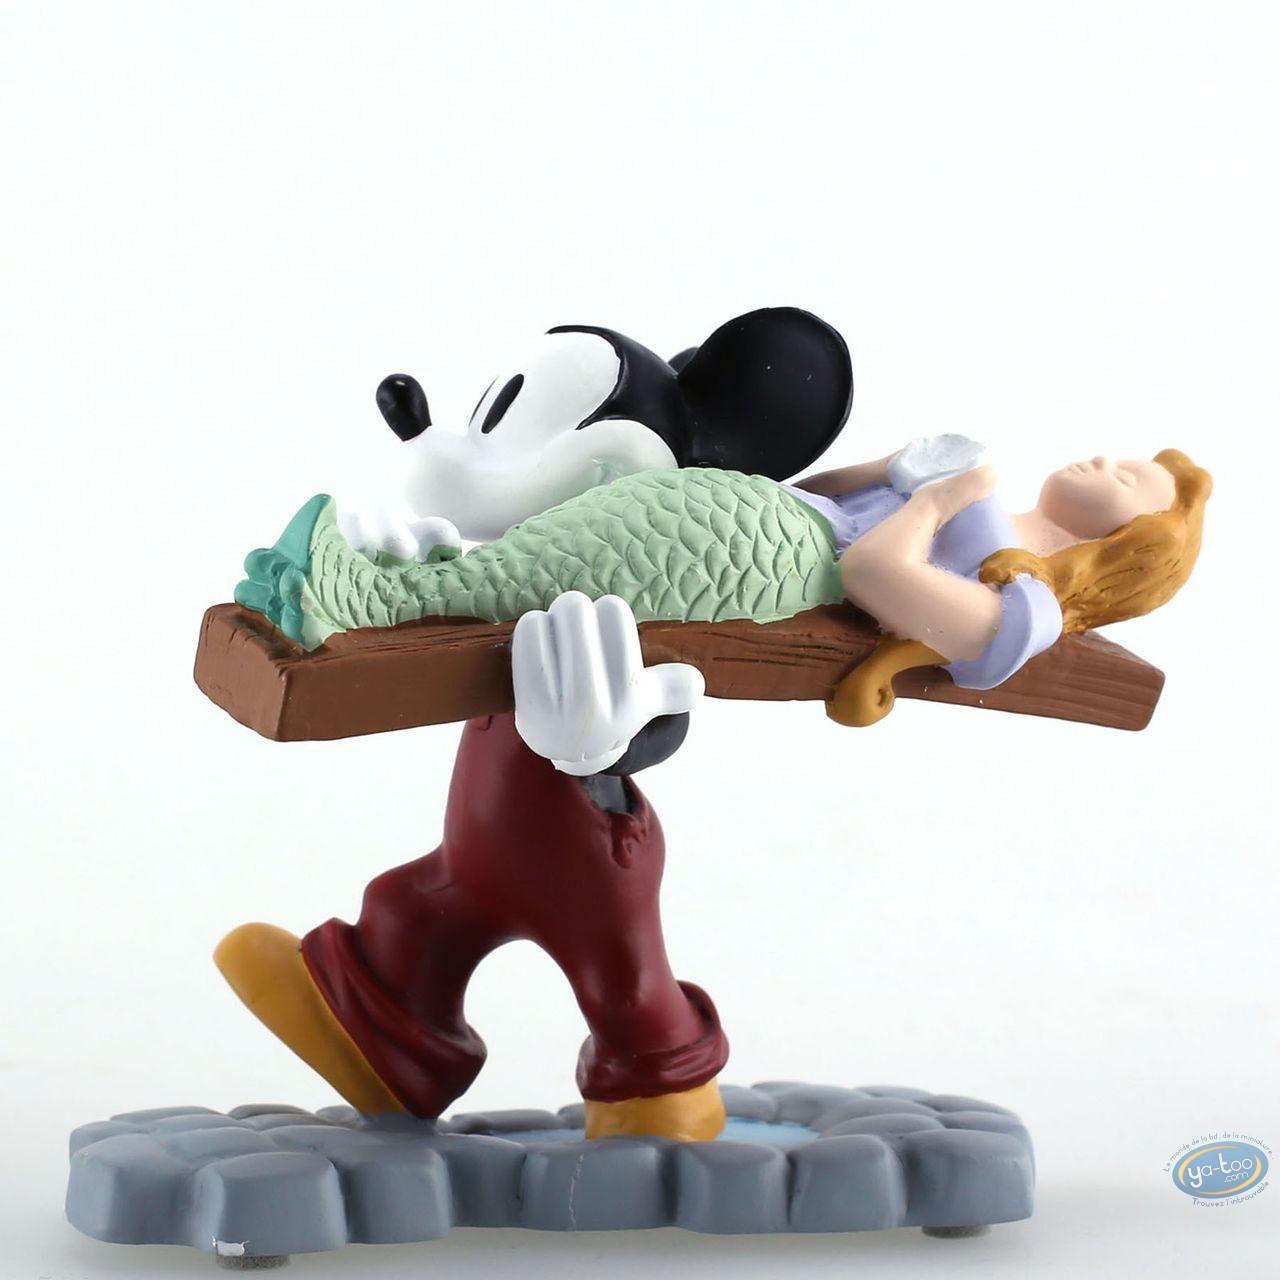 Statuette résine, Mickey Mouse : Mickey Boat Builders, Disney